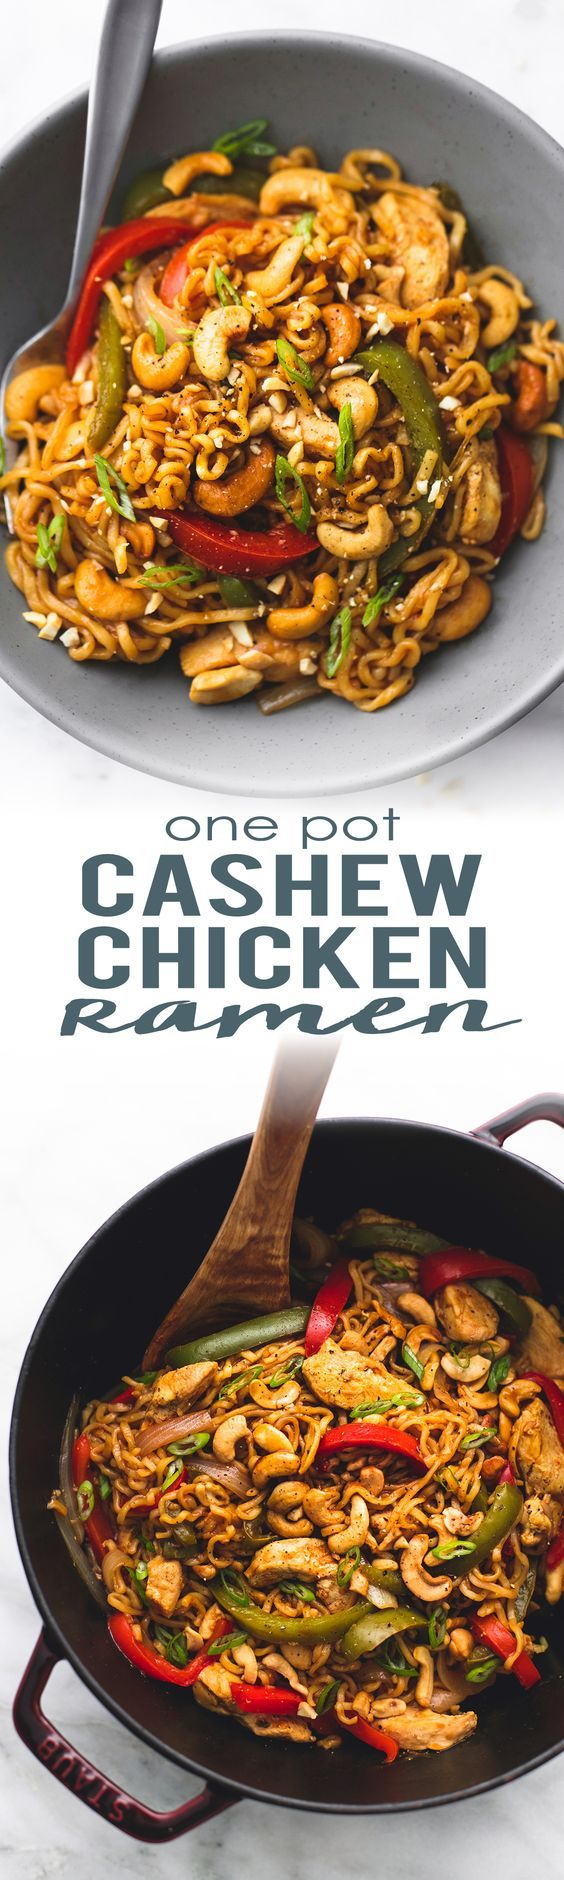 30 minute One Pot Cashew Chicken Ramen with veggies and a sweet n' savory Asian cashew stir fry sauce. | lecremedelacrumb.com